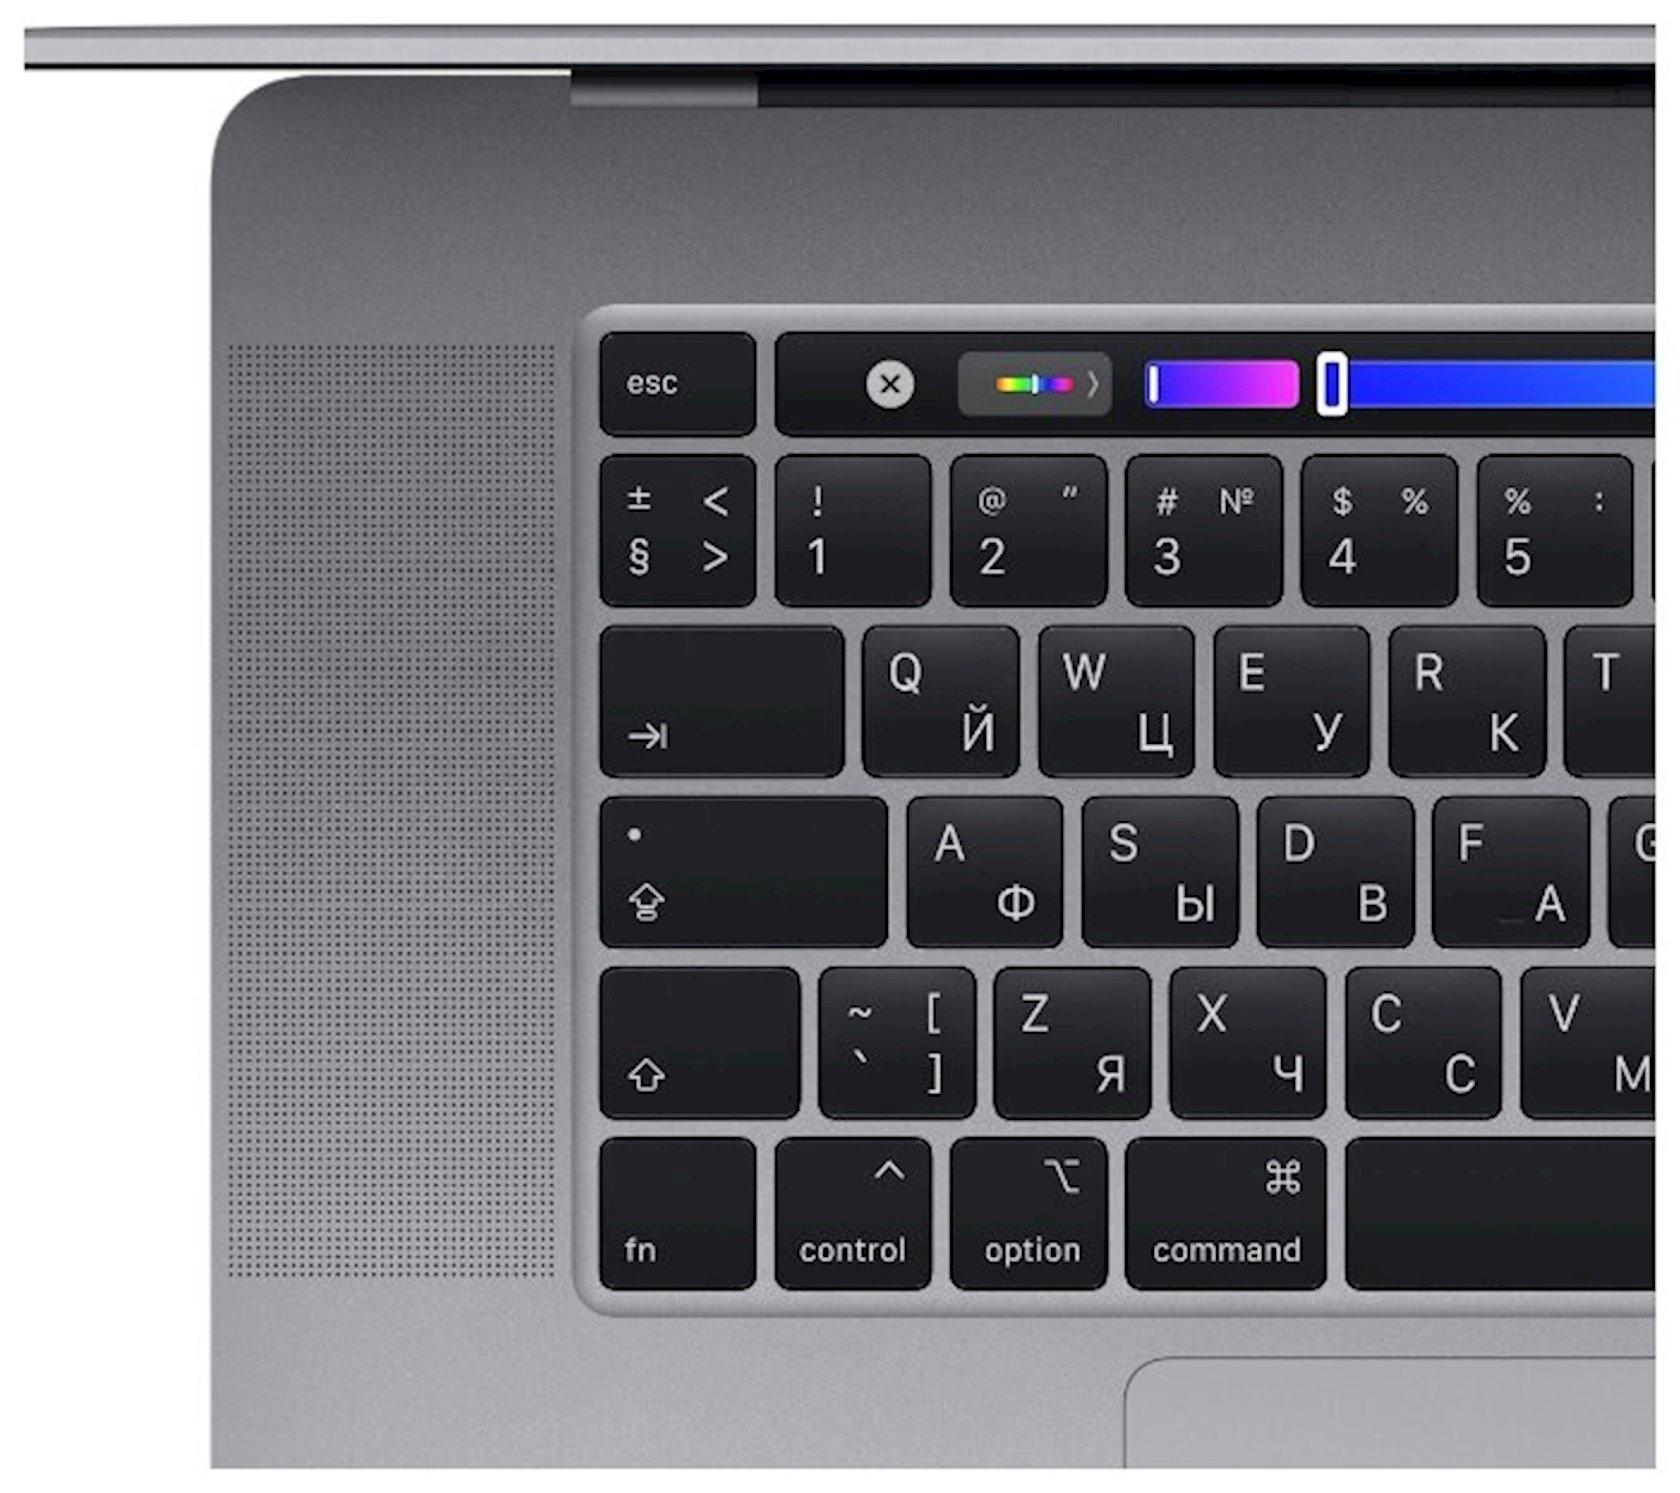 Noutbuk Apple MacBook Pro 16 inch, Touch Bar, IPS, Intel Core i7 9750H 2.6GHz, 16Gb, 512Gb SSD, Radeon Pro 5300M - 4096 Mb, macOS, MVVJ2RU/A, Boz